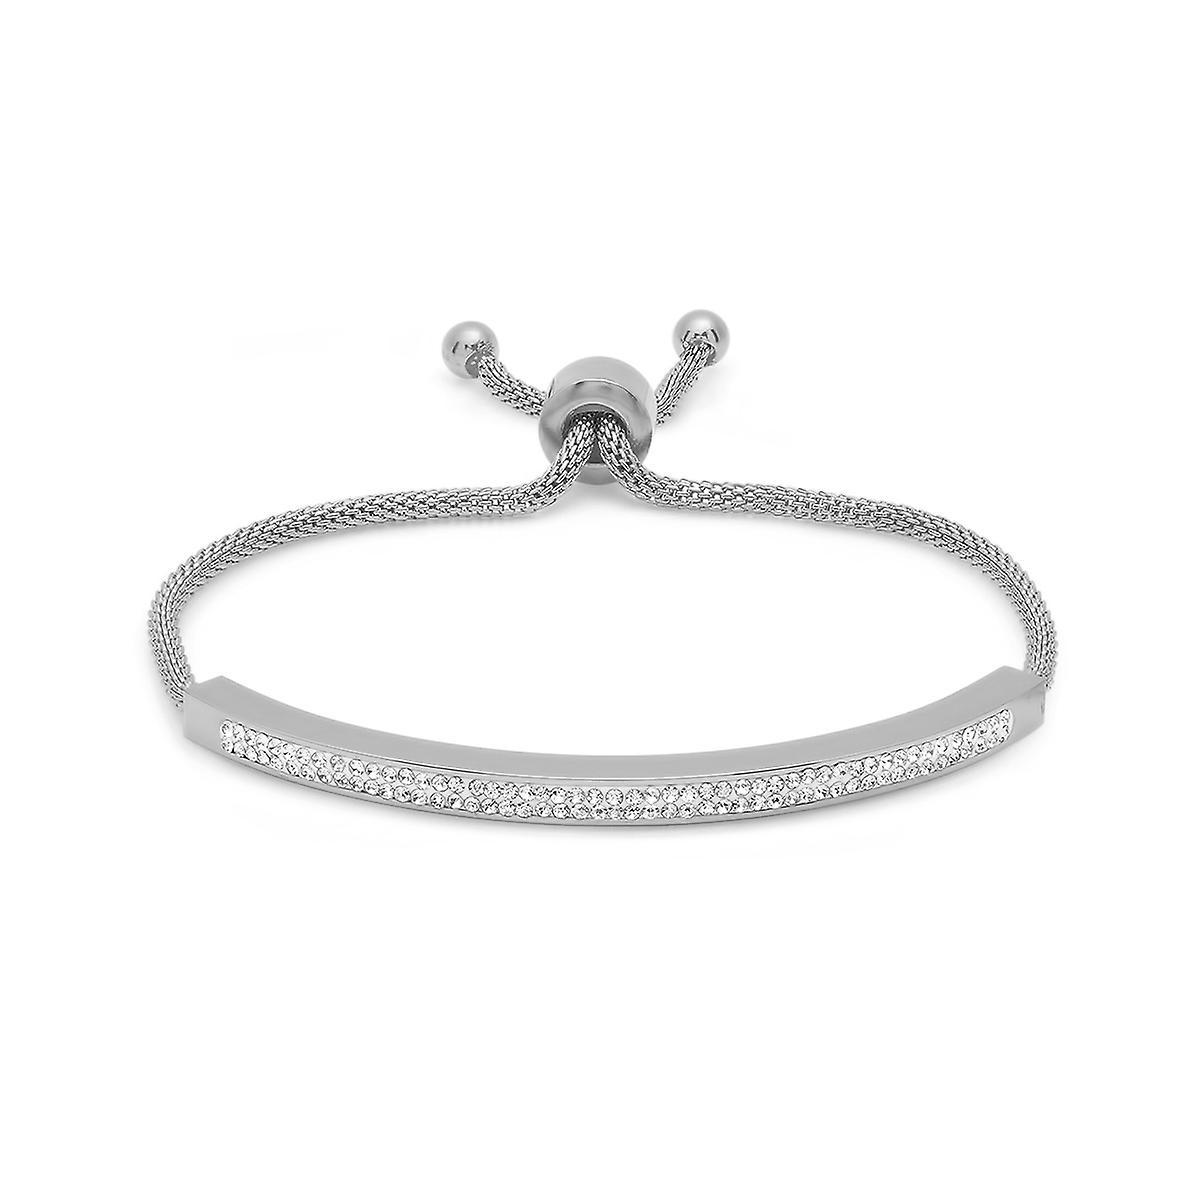 Ladies Stainless Steel White Simulated Diamond Id Drawstring Bracelet